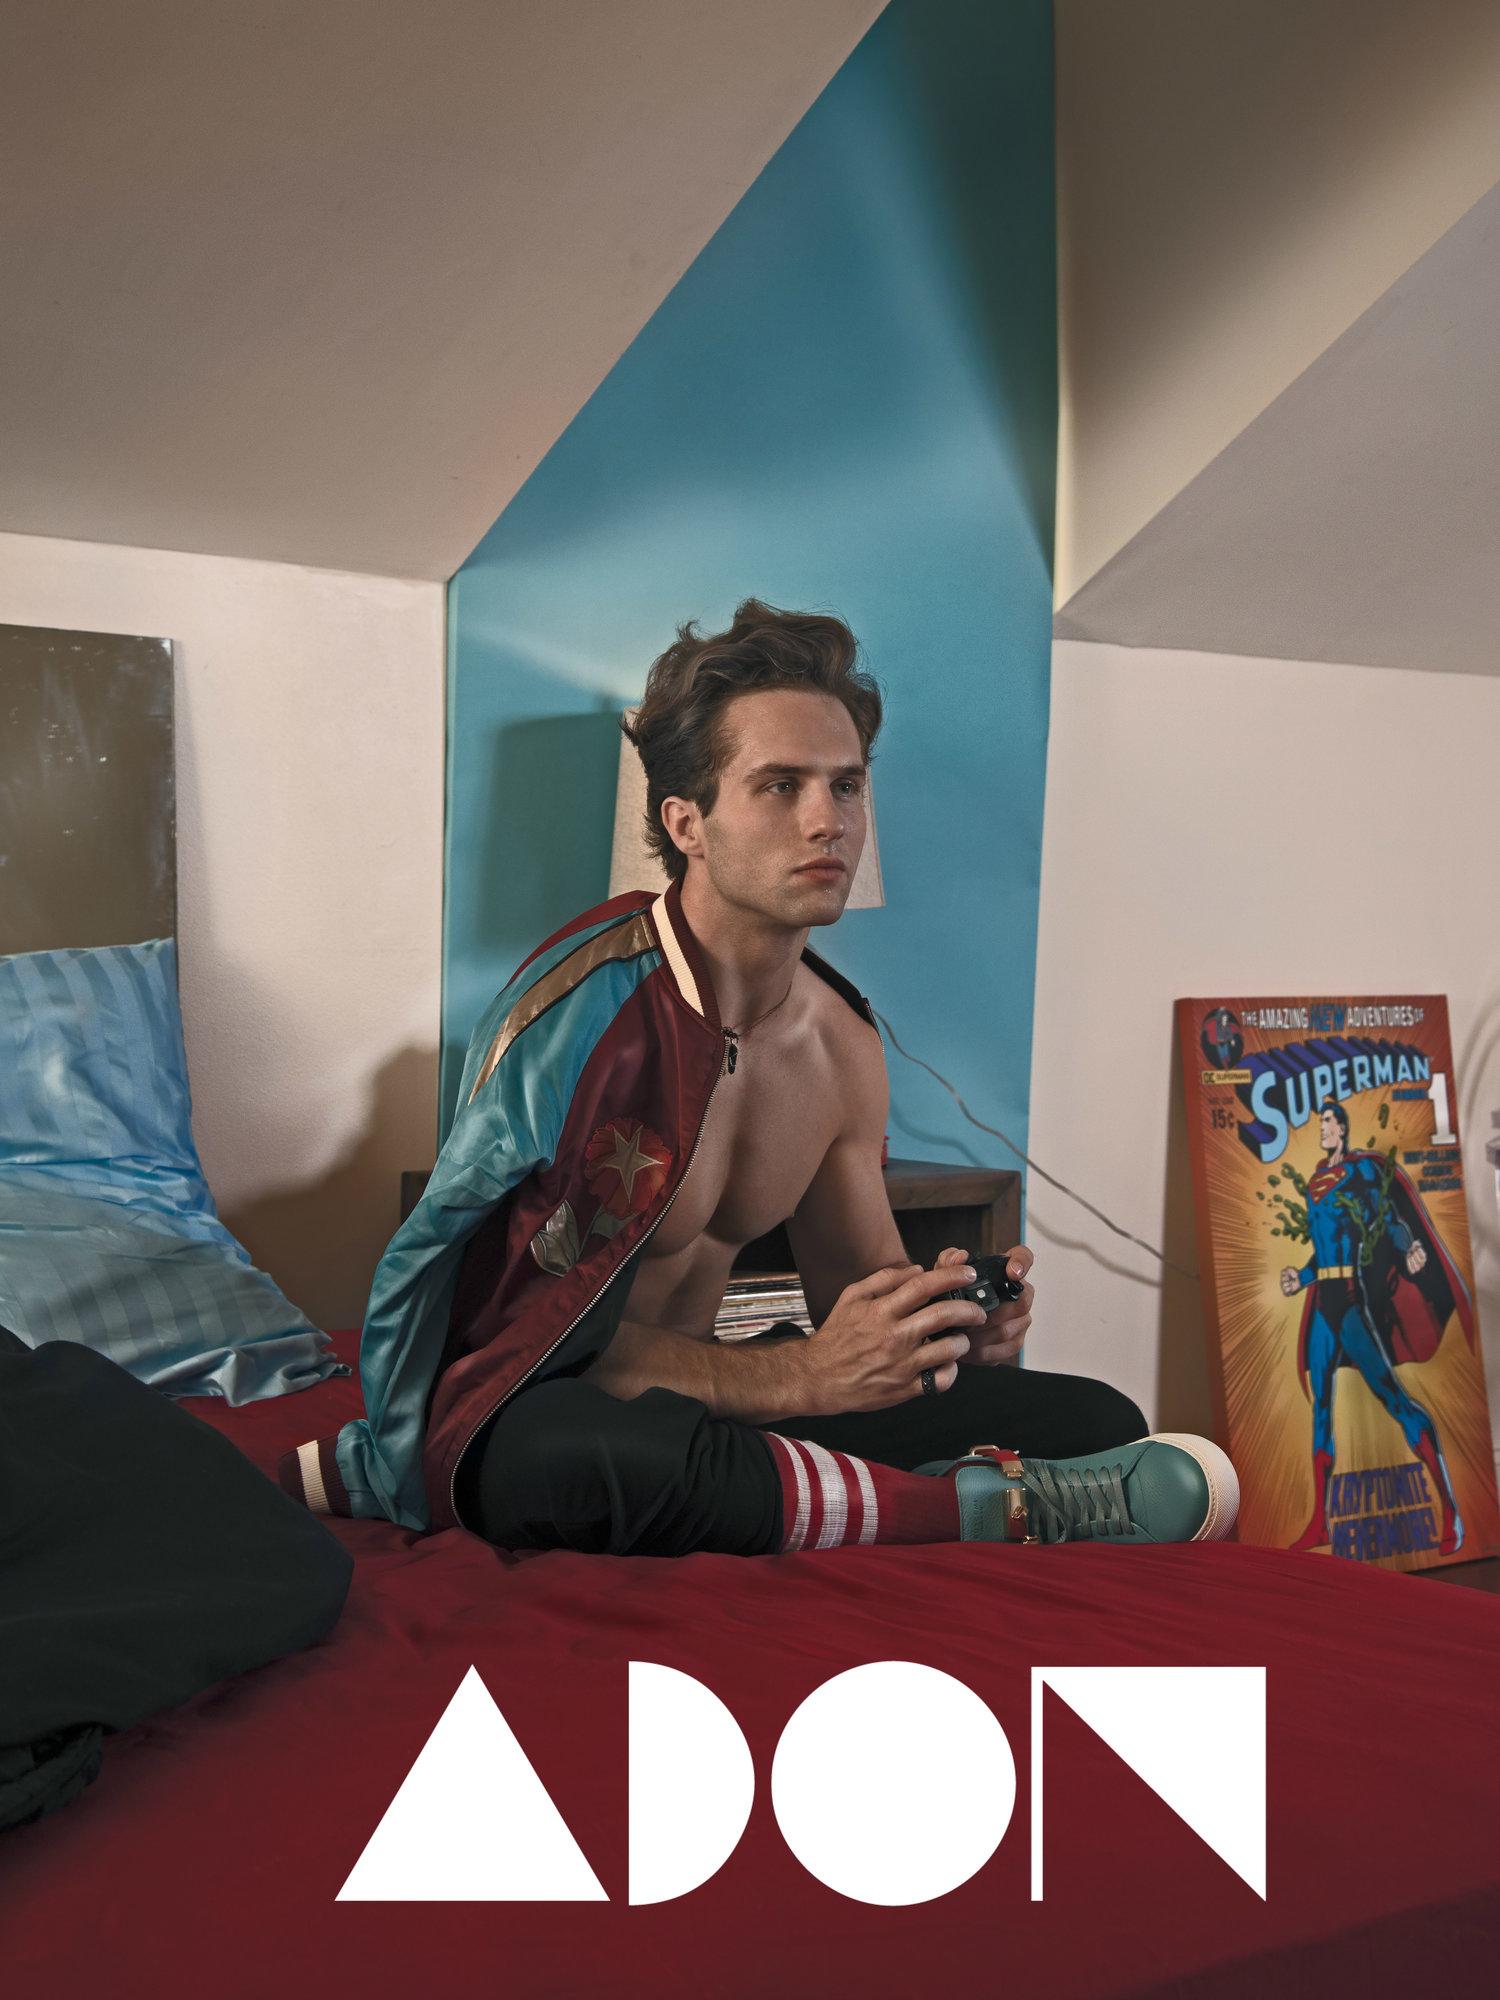 Adon Exclusive: Model Brant Harris By Viktor Klimenko